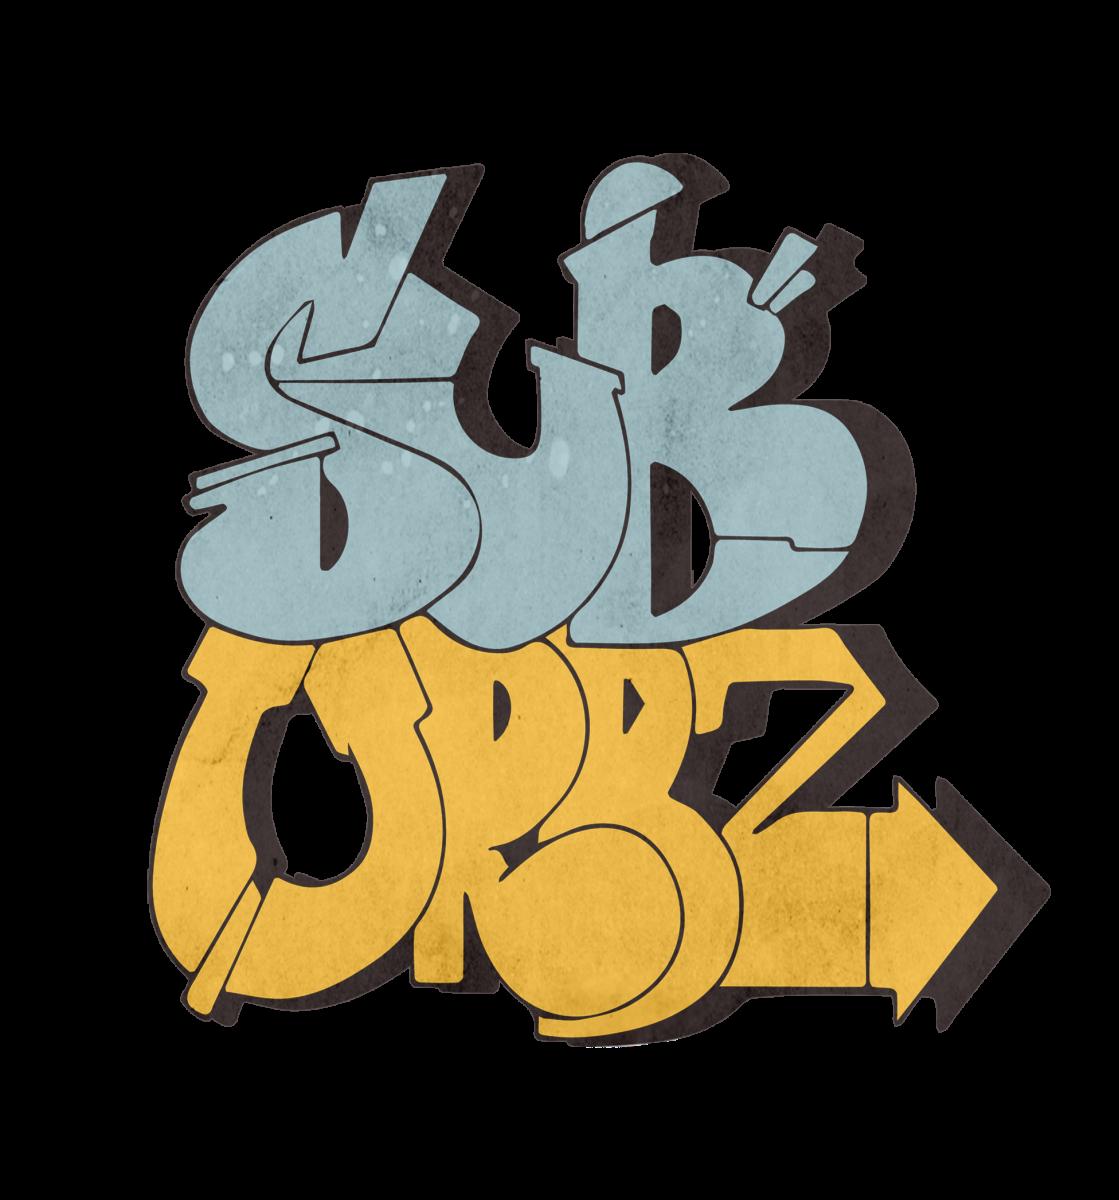 suburbz.png